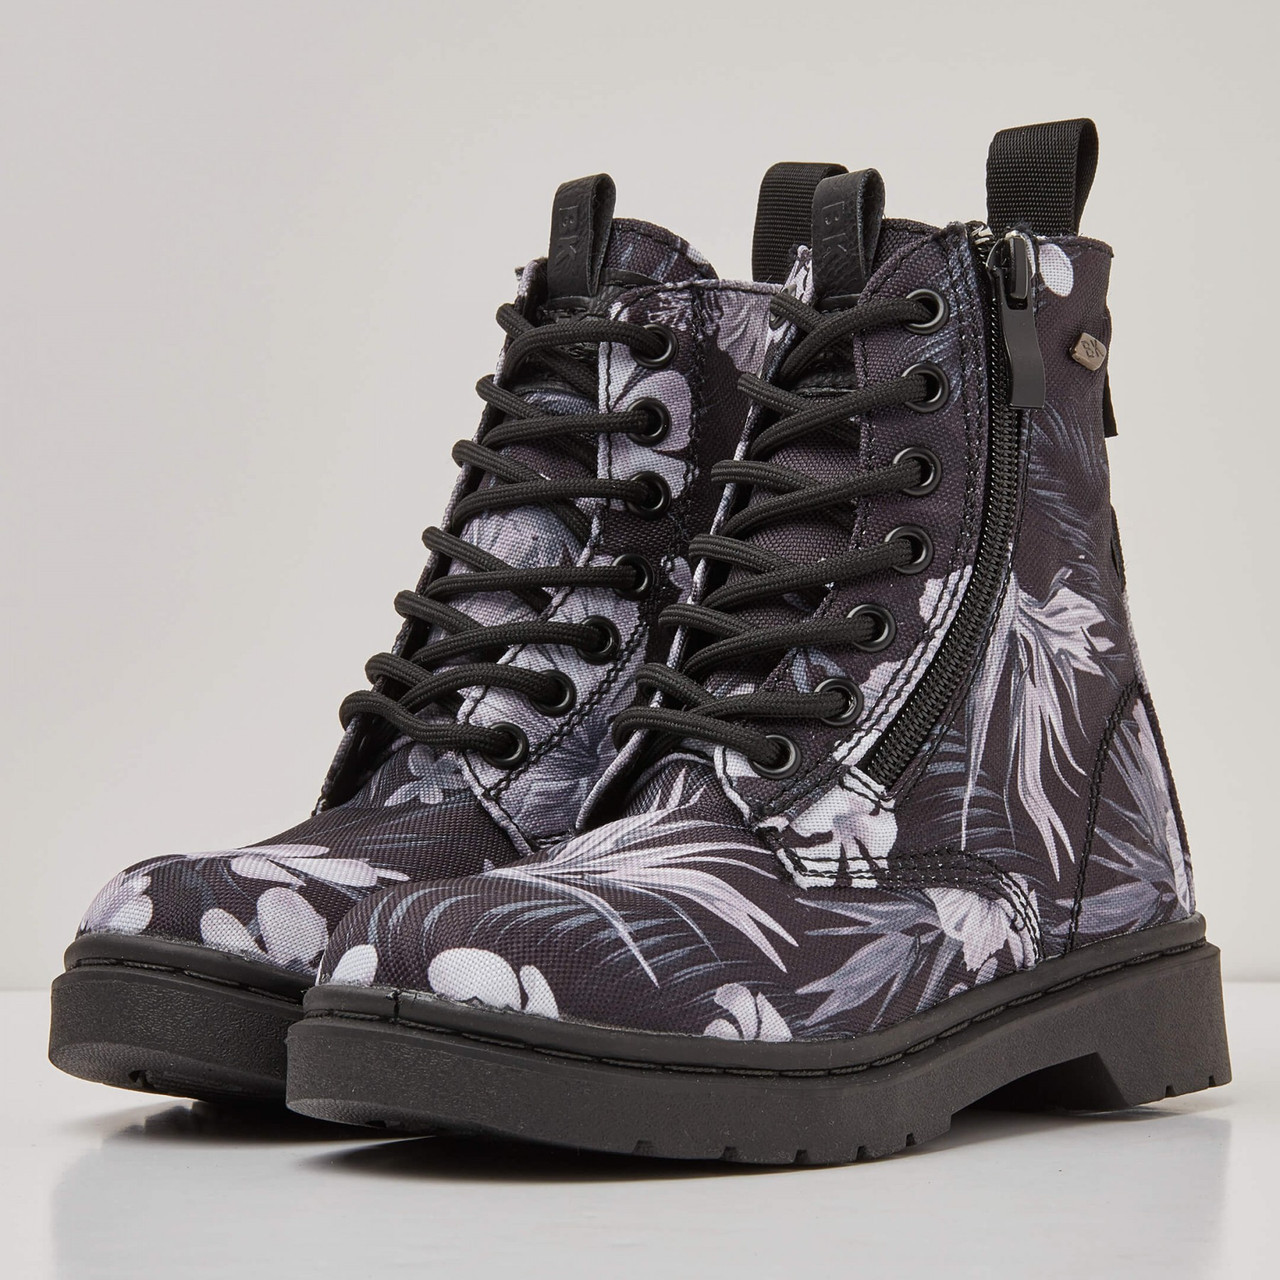 Ботинки для девочки British Knights Размер - 32 (21 см)